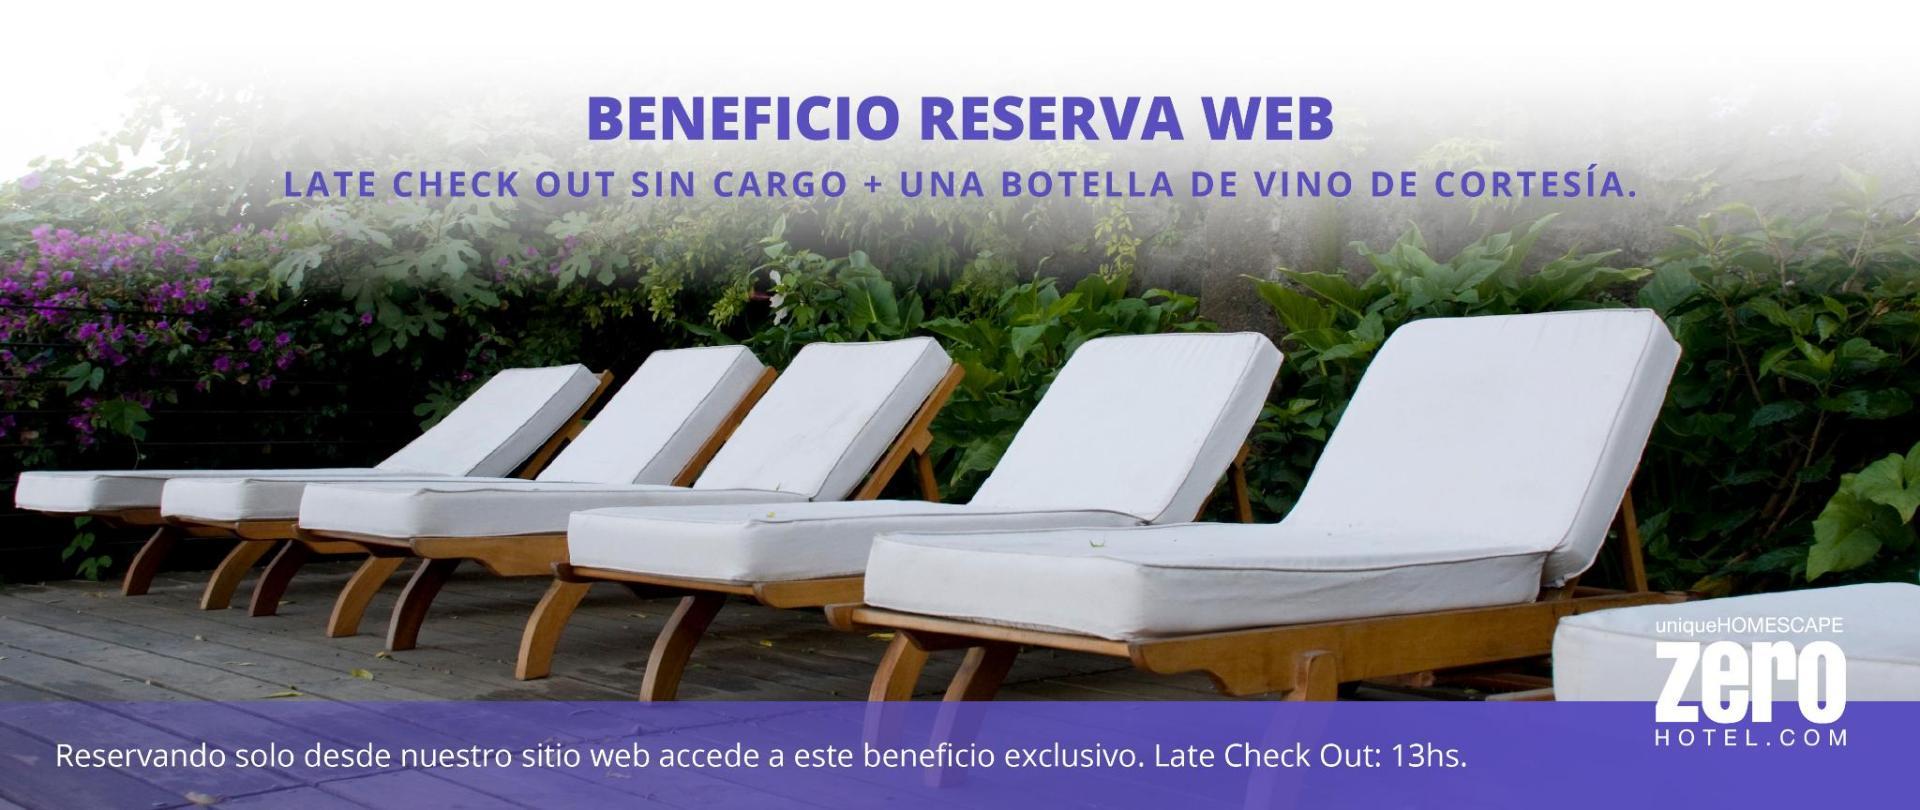 banner-promo-web02.jpg